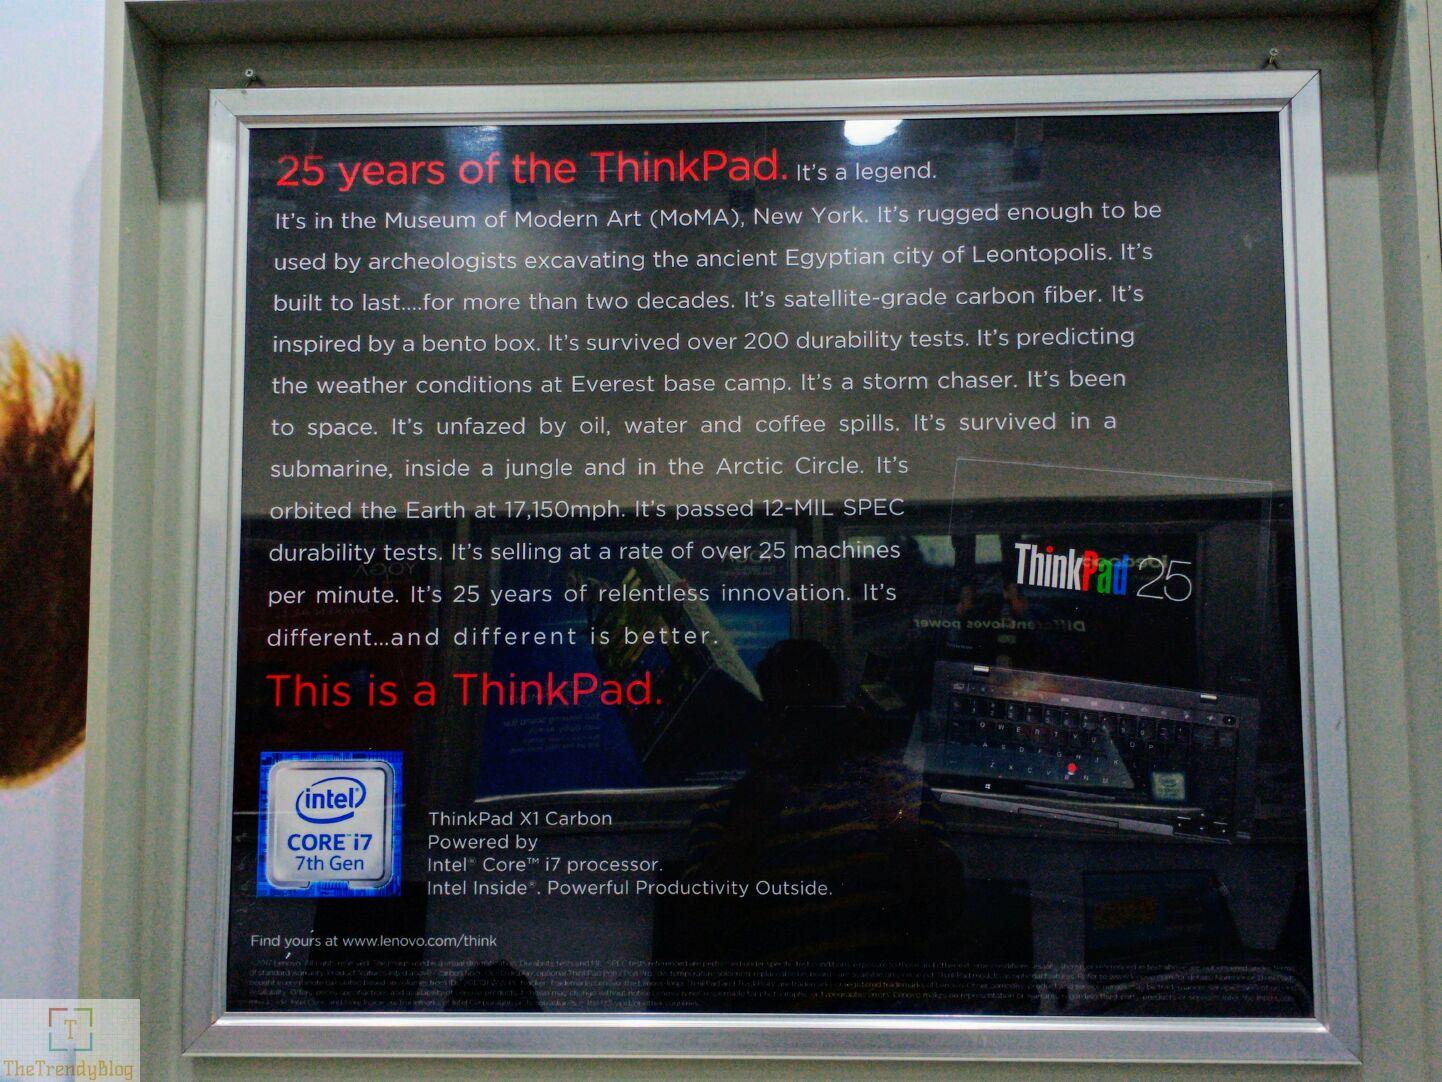 Lenovo Store - Thinkpad X1 Carbon